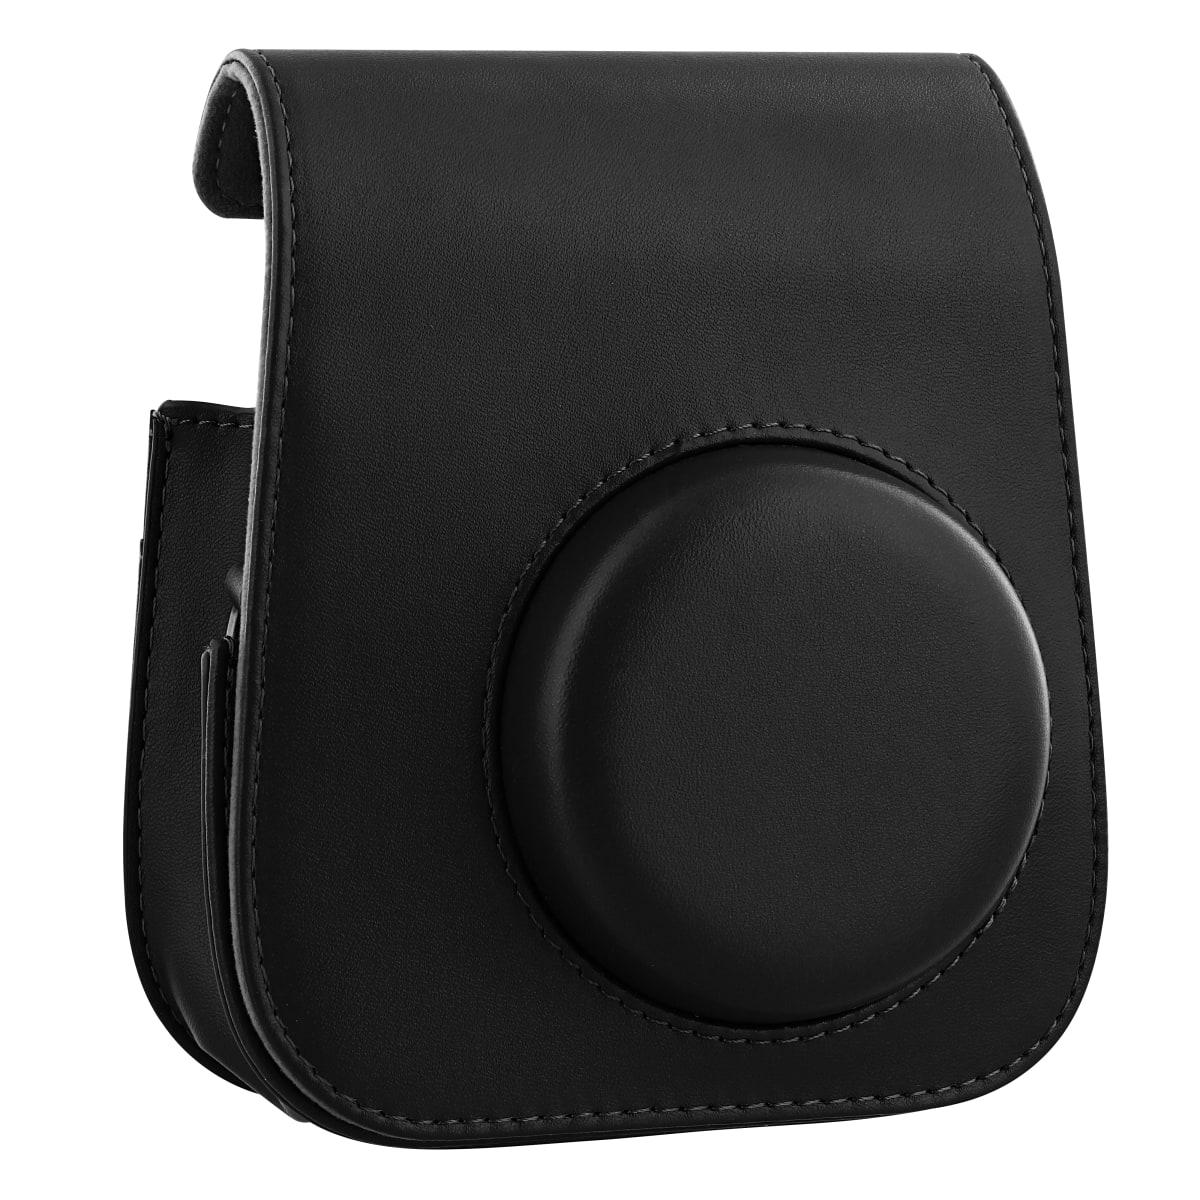 Instax mini 11 black case